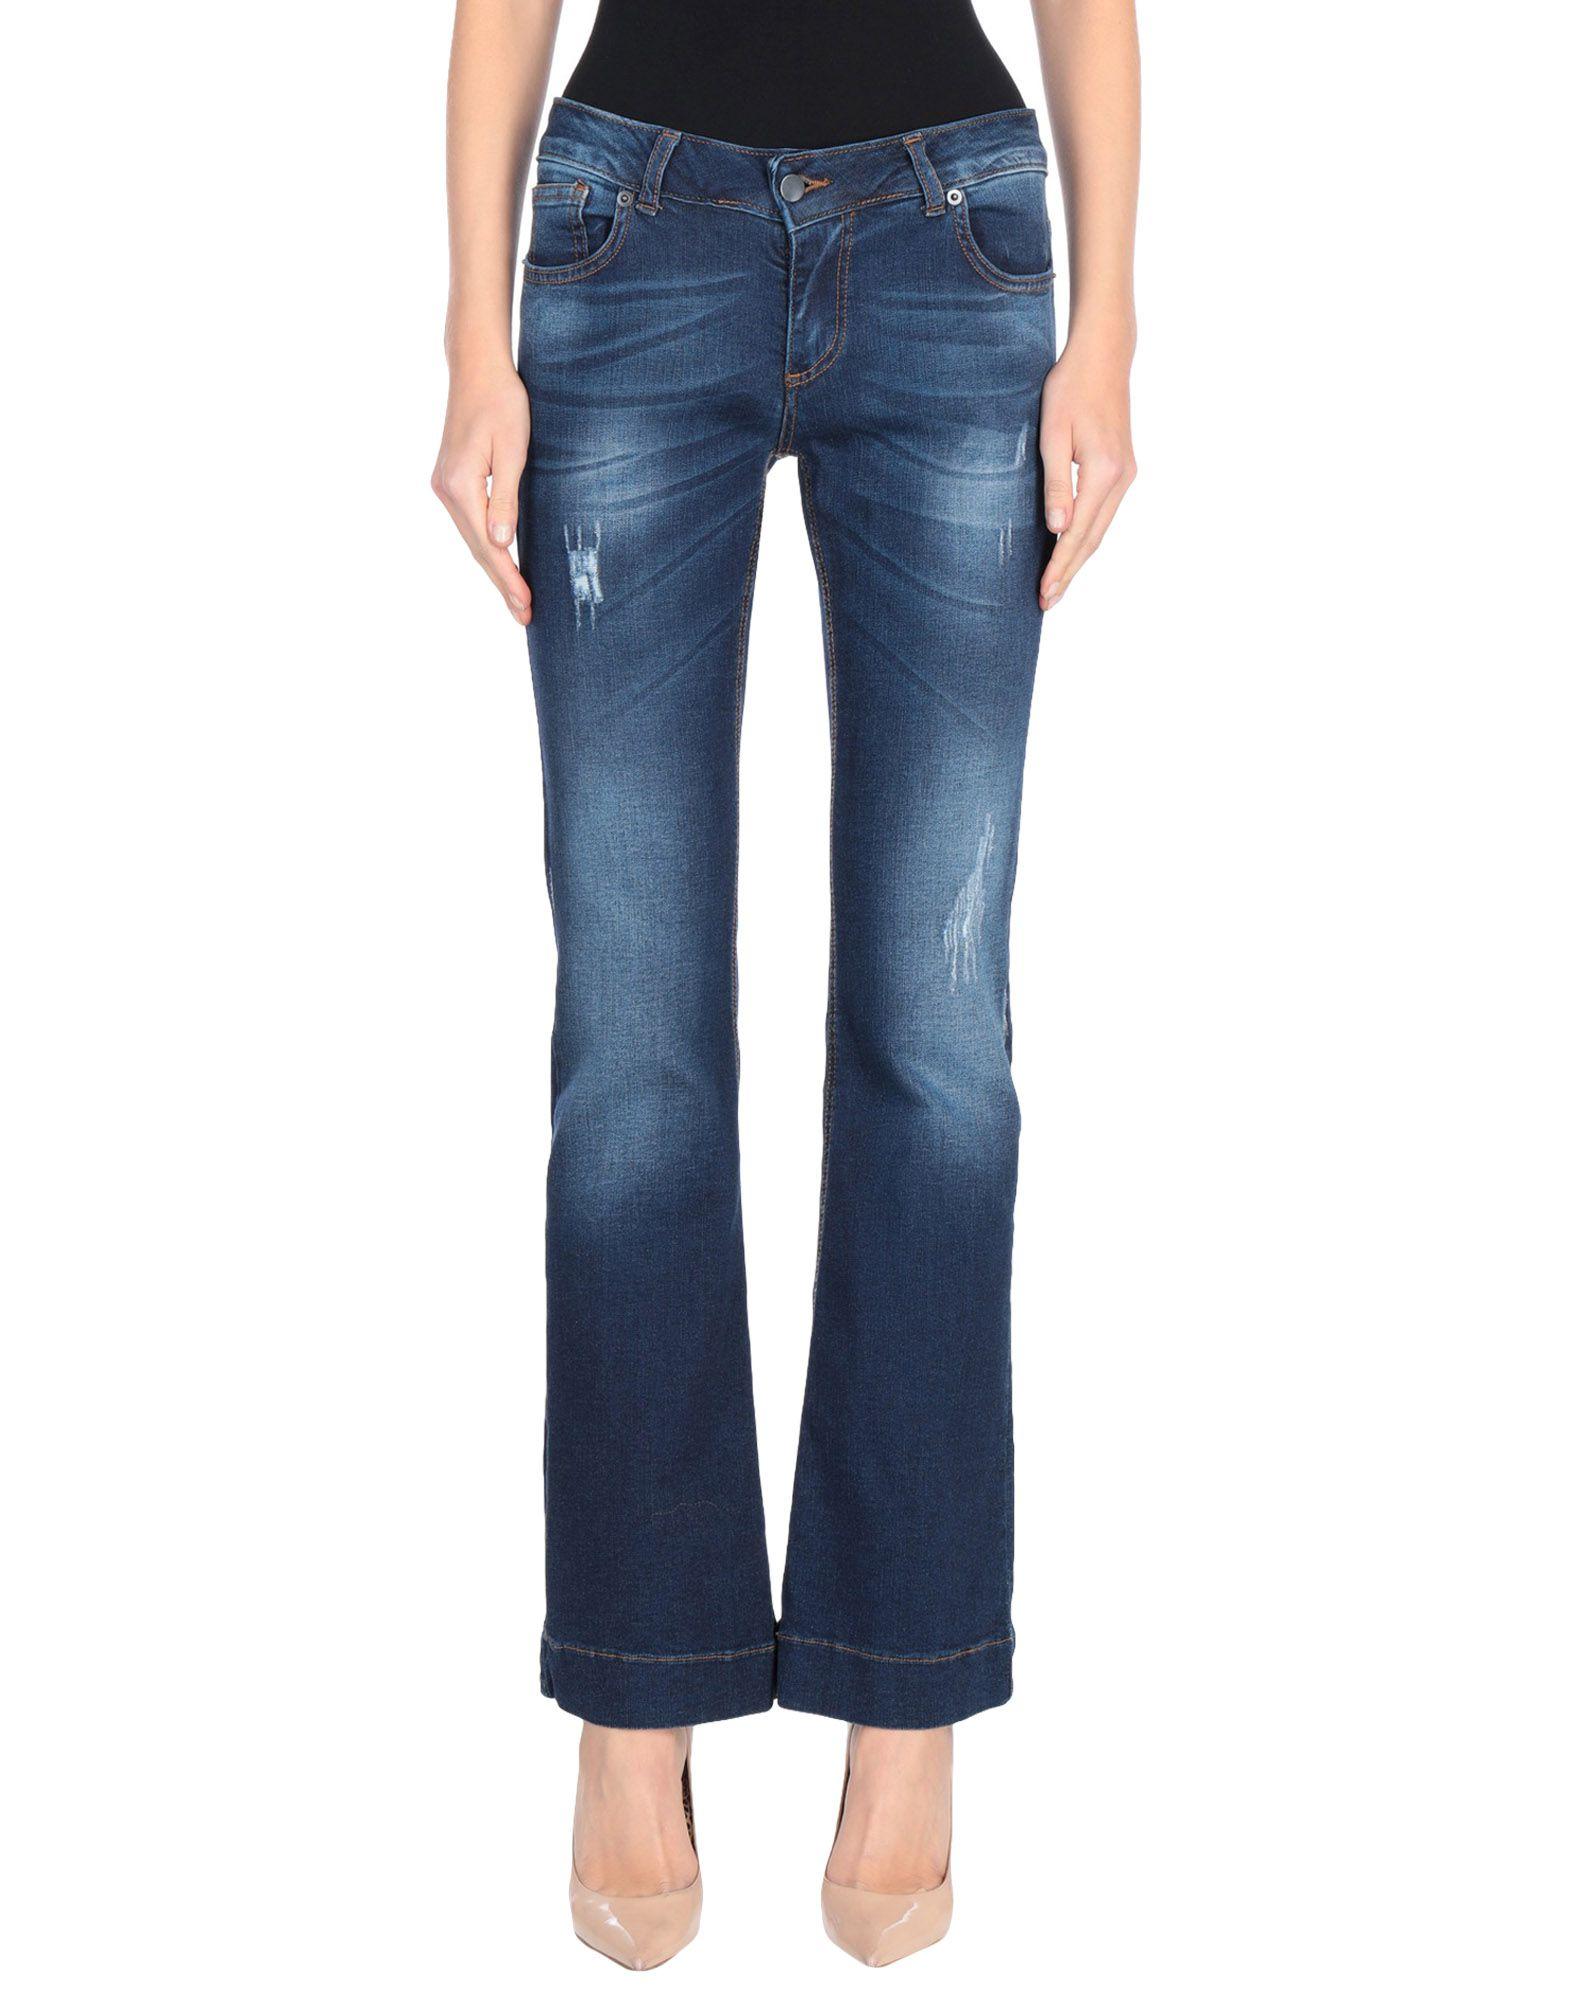 Pantaloni Jeans Kimika donna - - 42712329HB  100% nagelneu mit ursprünglicher Qualität